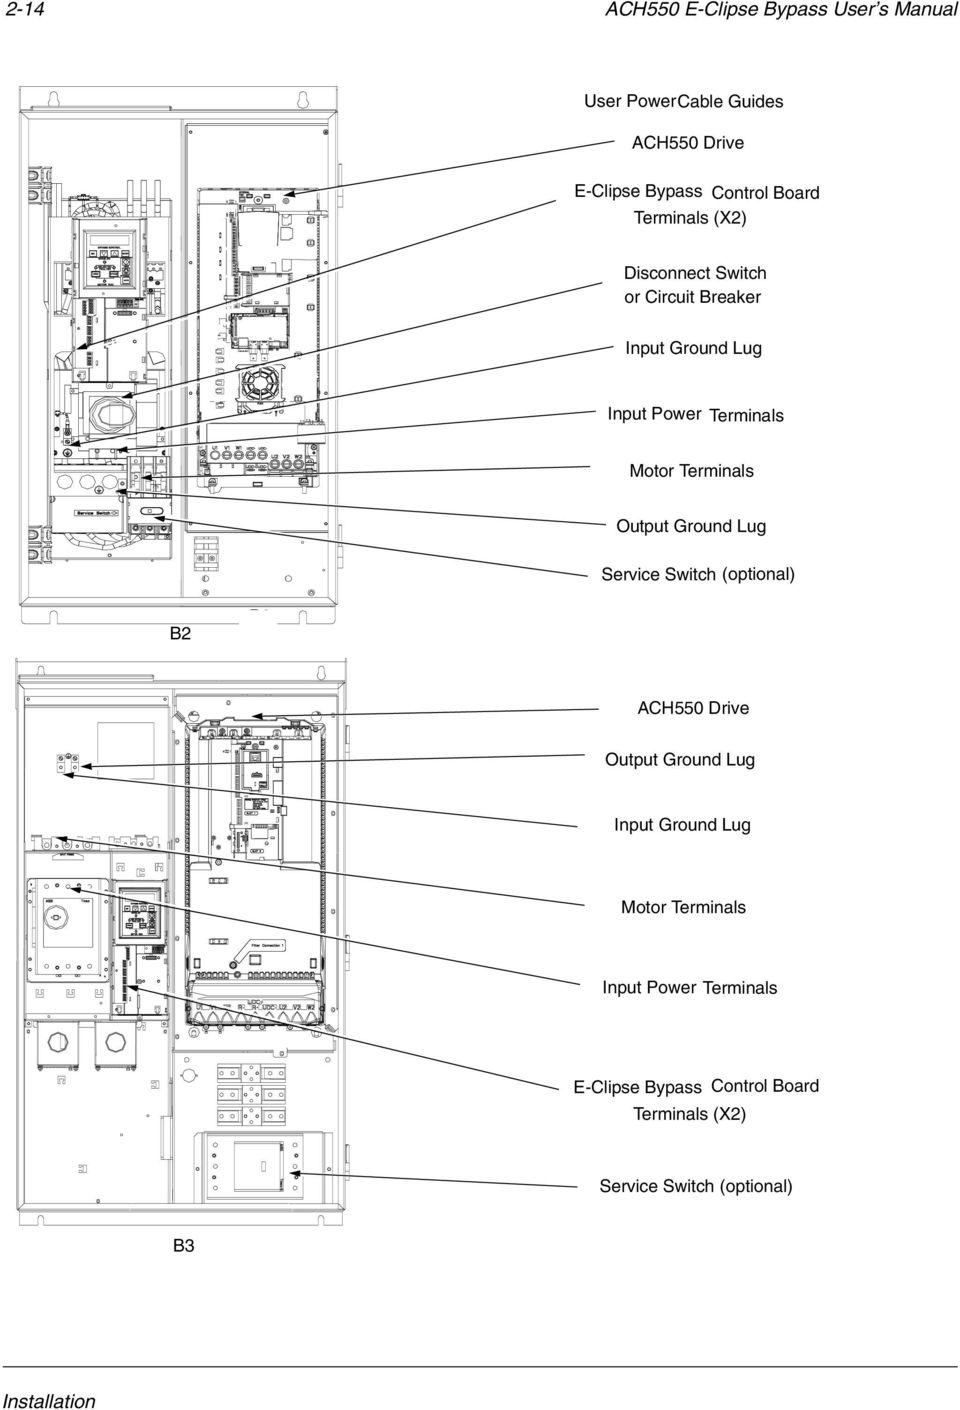 medium resolution of ach550 bcr bdr vcr vdr e clipse bypass drives user s manual ach550output ground lug service